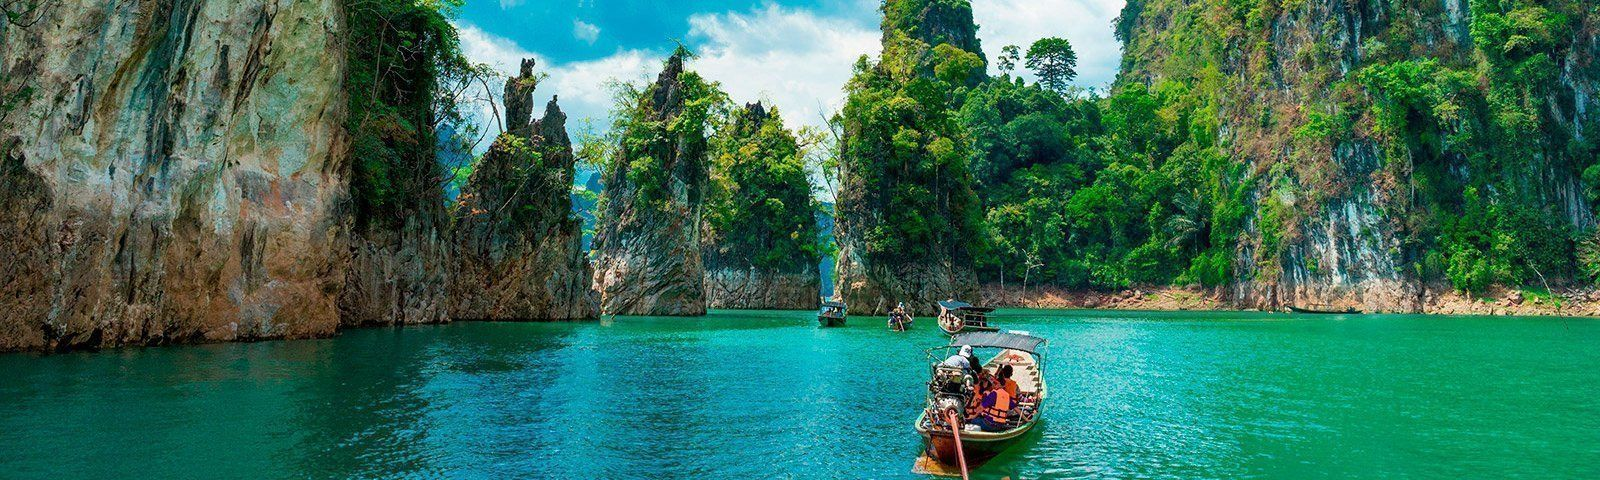 travesia-tailandia-barco-catamaran (6)